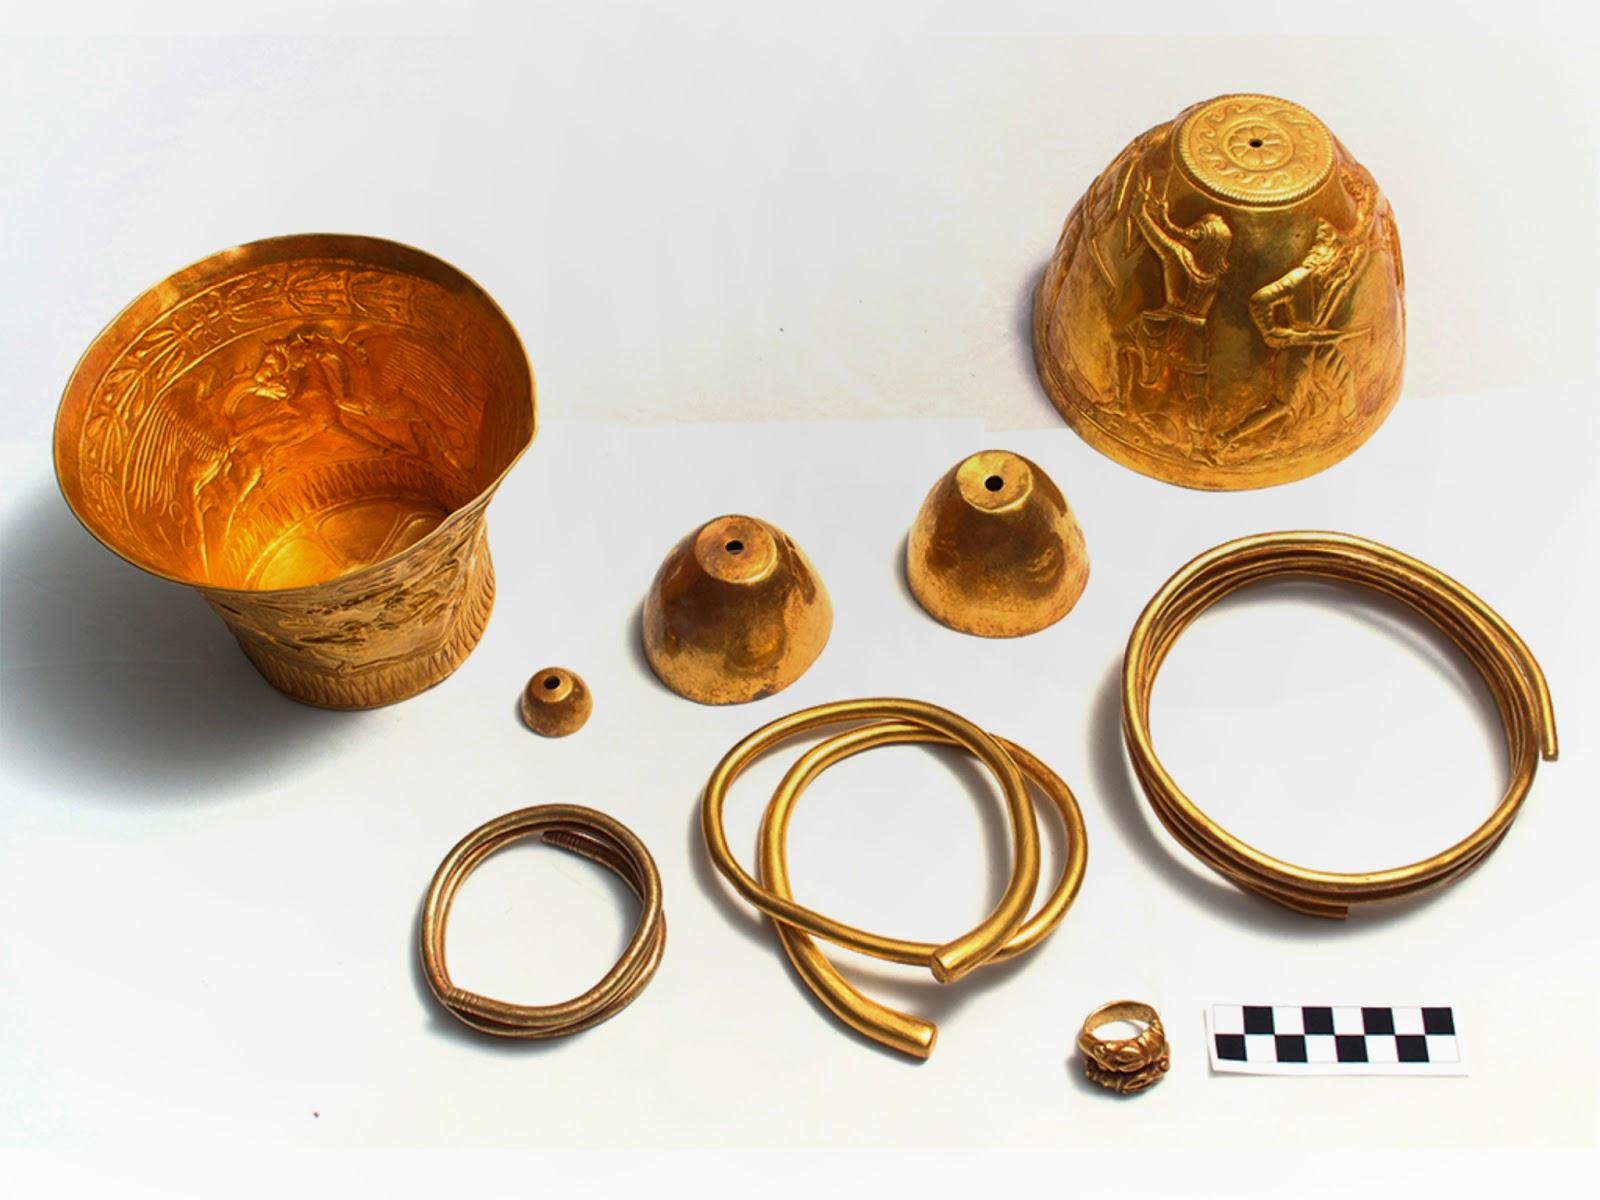 Scythian gold vessels used in 'hemp rituals'